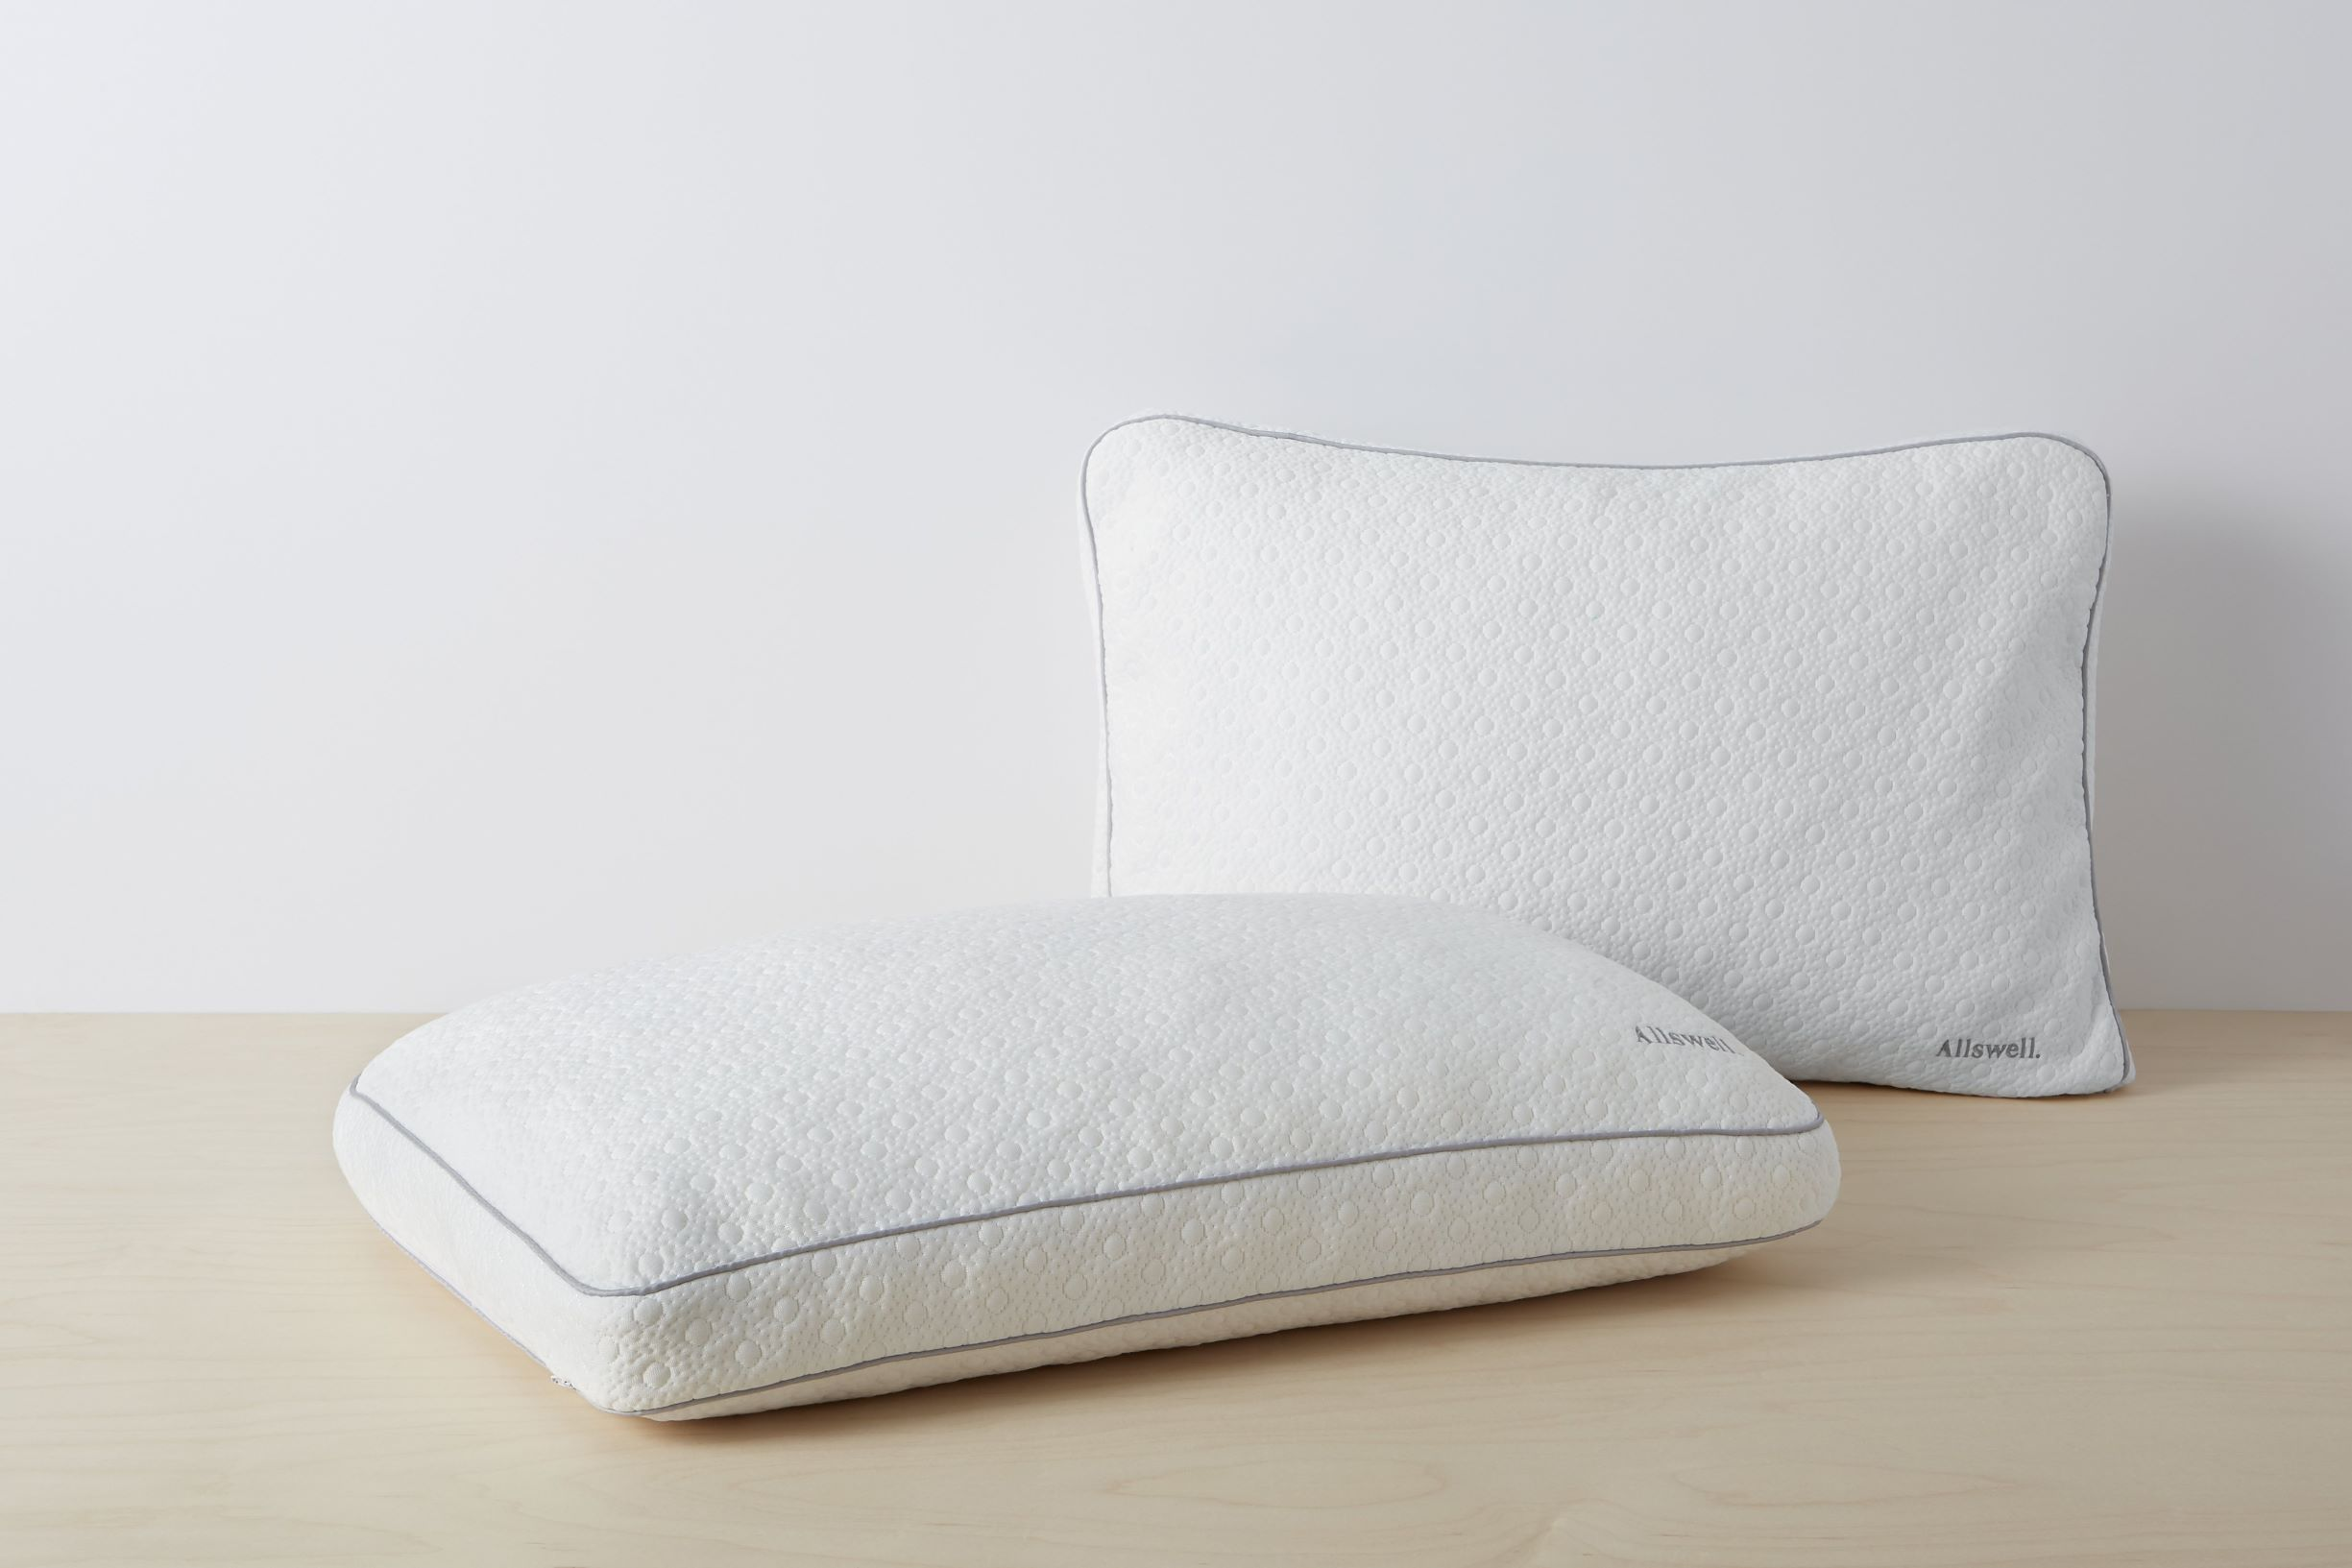 the flex pillow review